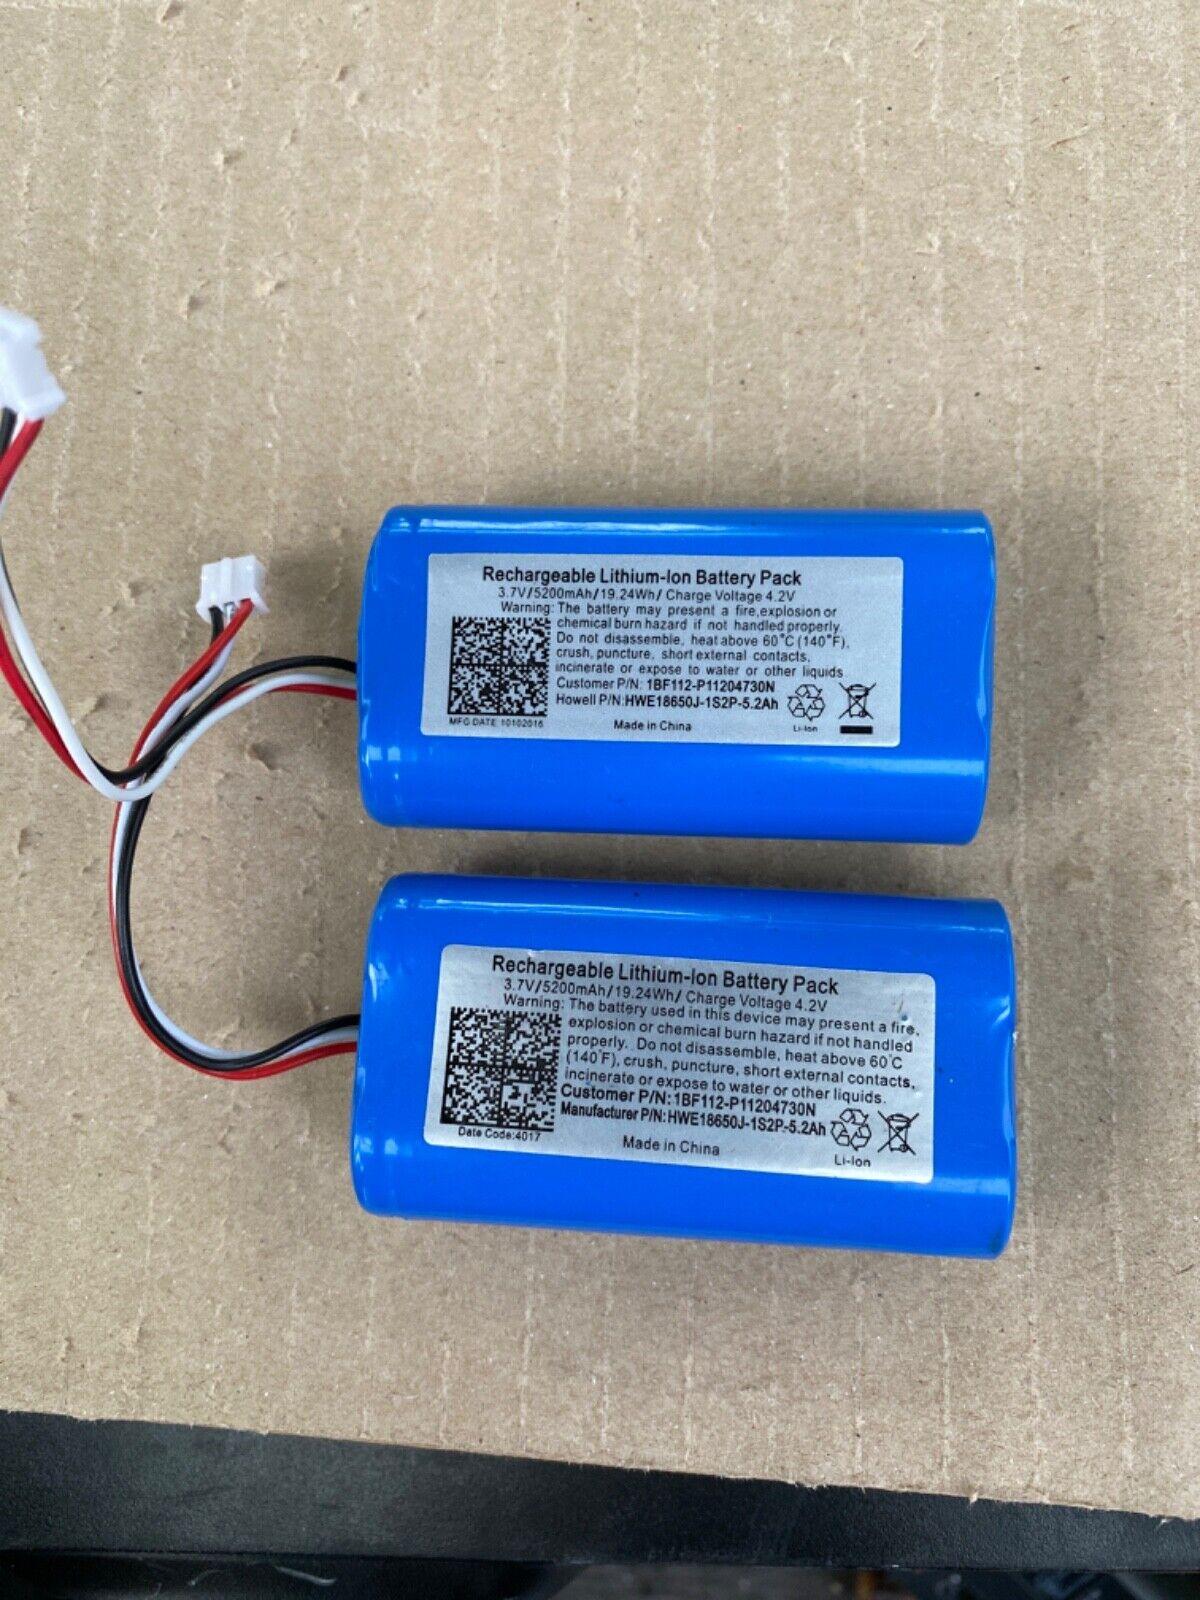 (2) pack Rechargable Lithium Battery Pack 3.7V/5200mAh/19.24Wh